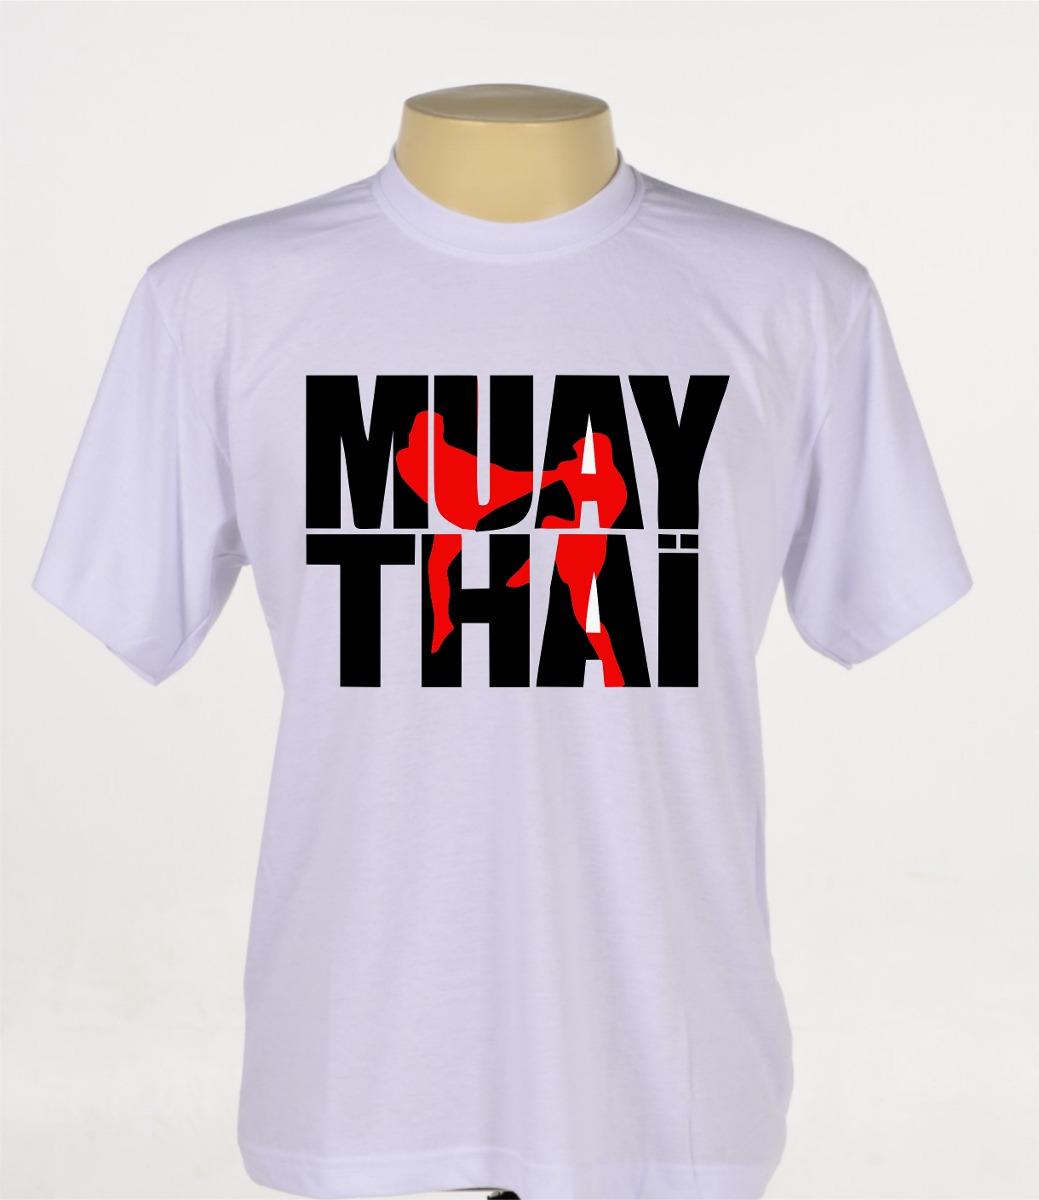 2ca3b99af camisa camiseta personalizada muay thai mma ufc academia. Carregando zoom.